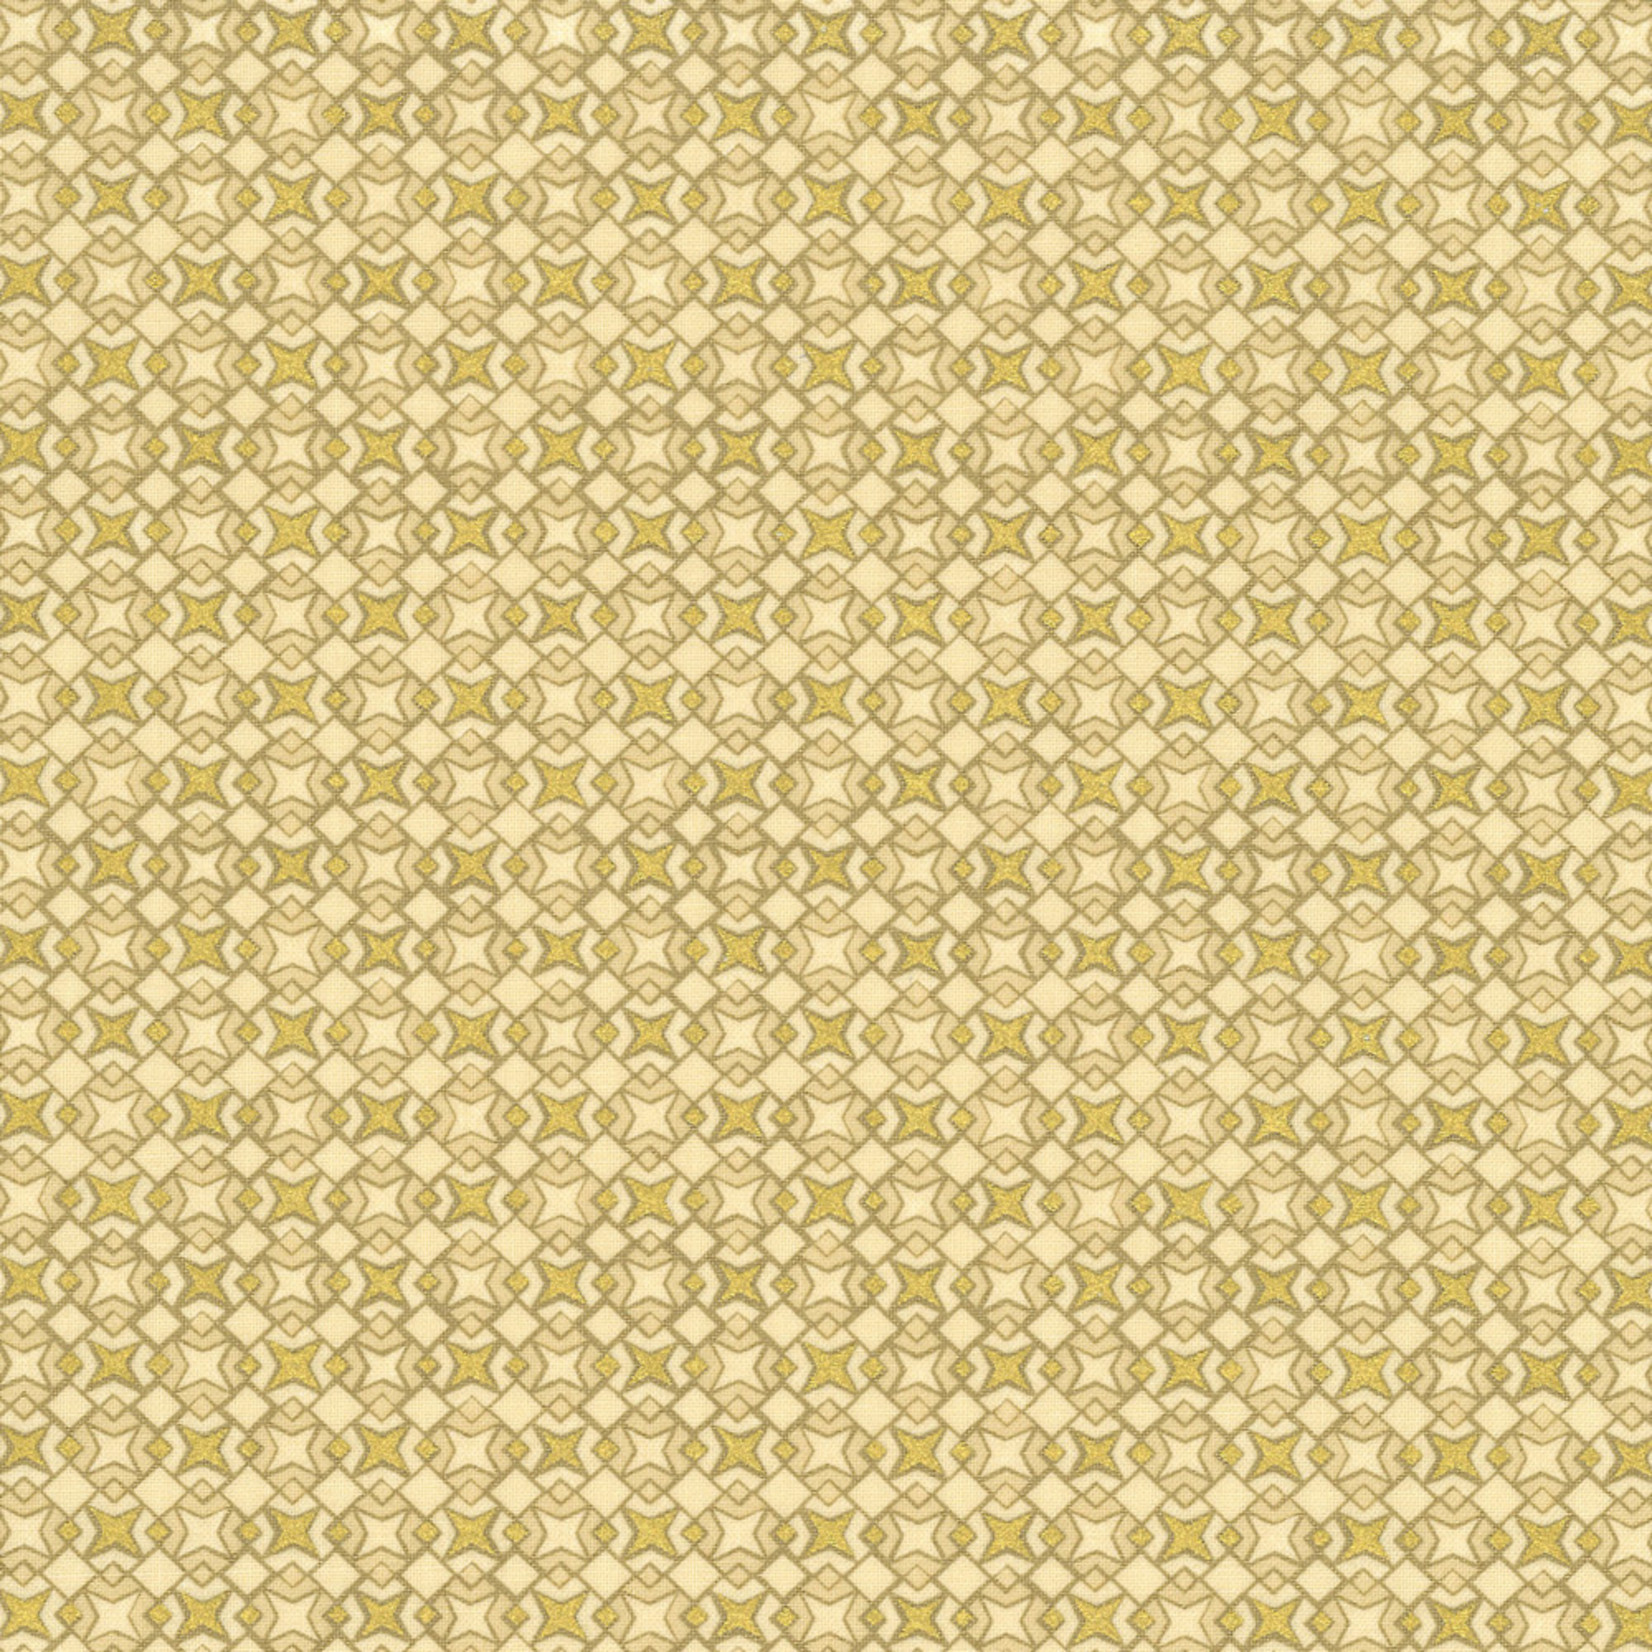 Stof Fabrics Christmas Wonders - Tiles - Beige Gold